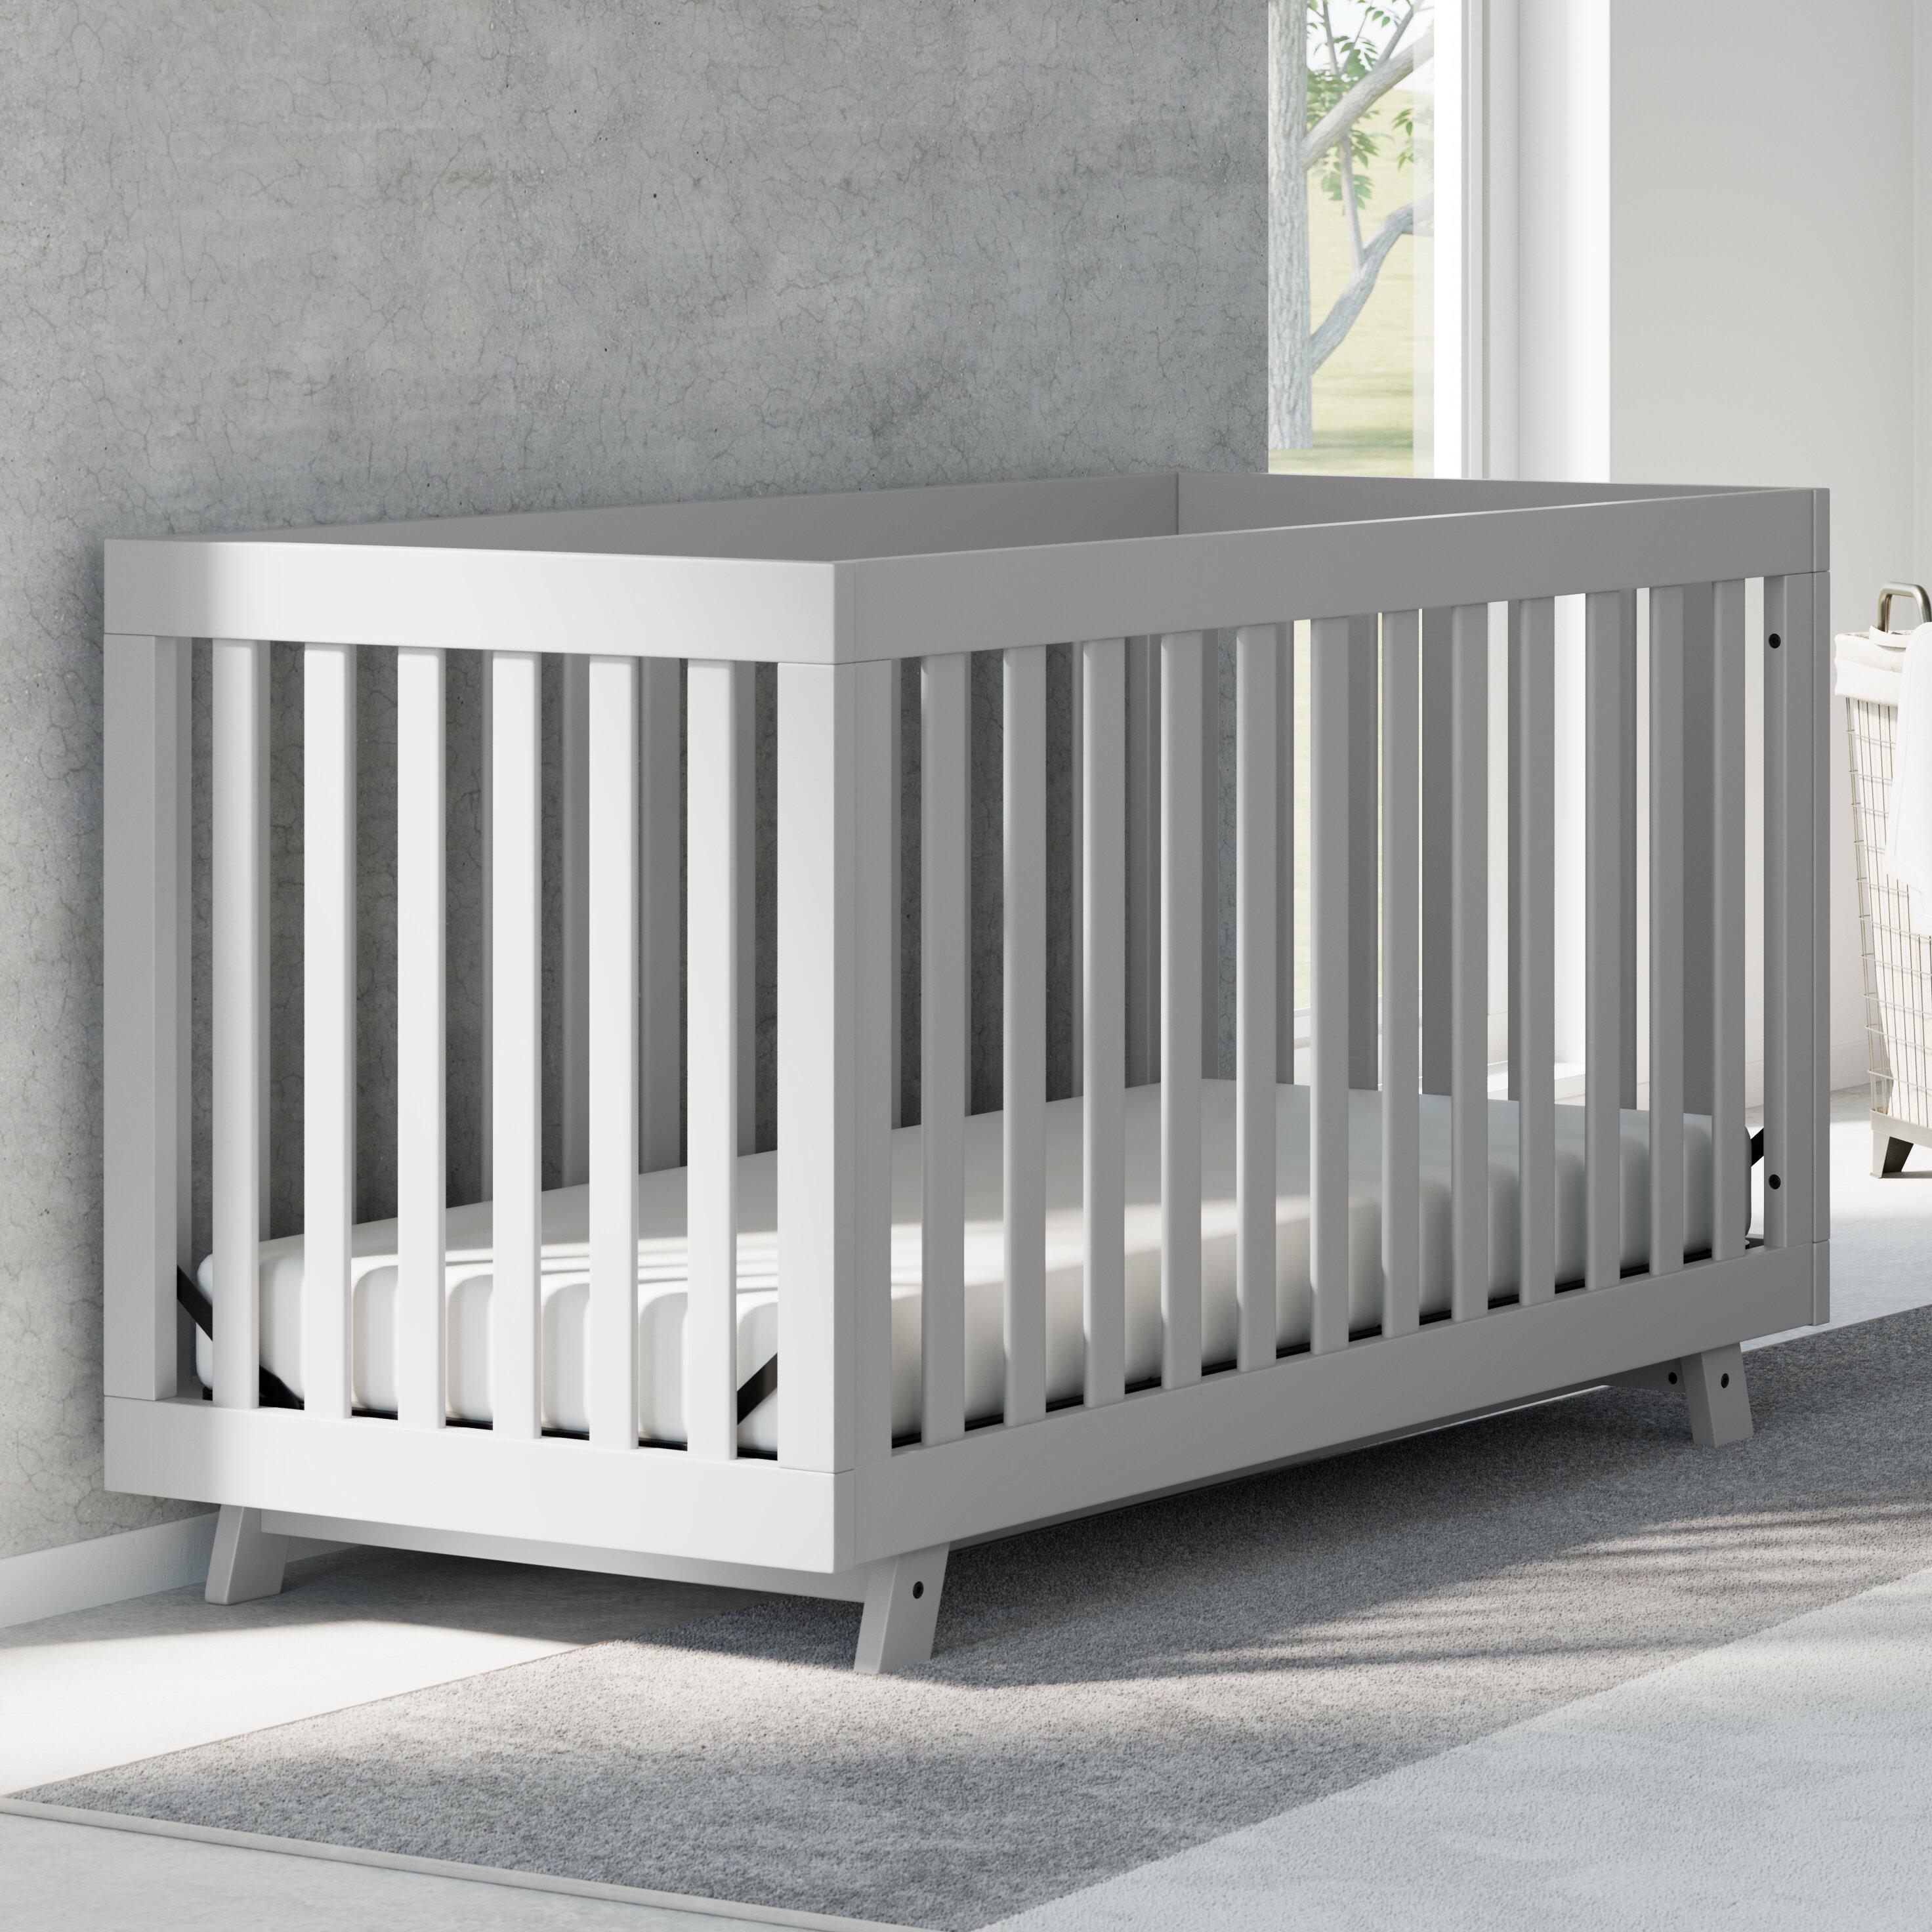 Wayfair   Modern & Contemporary Cribs You'll Love in 21